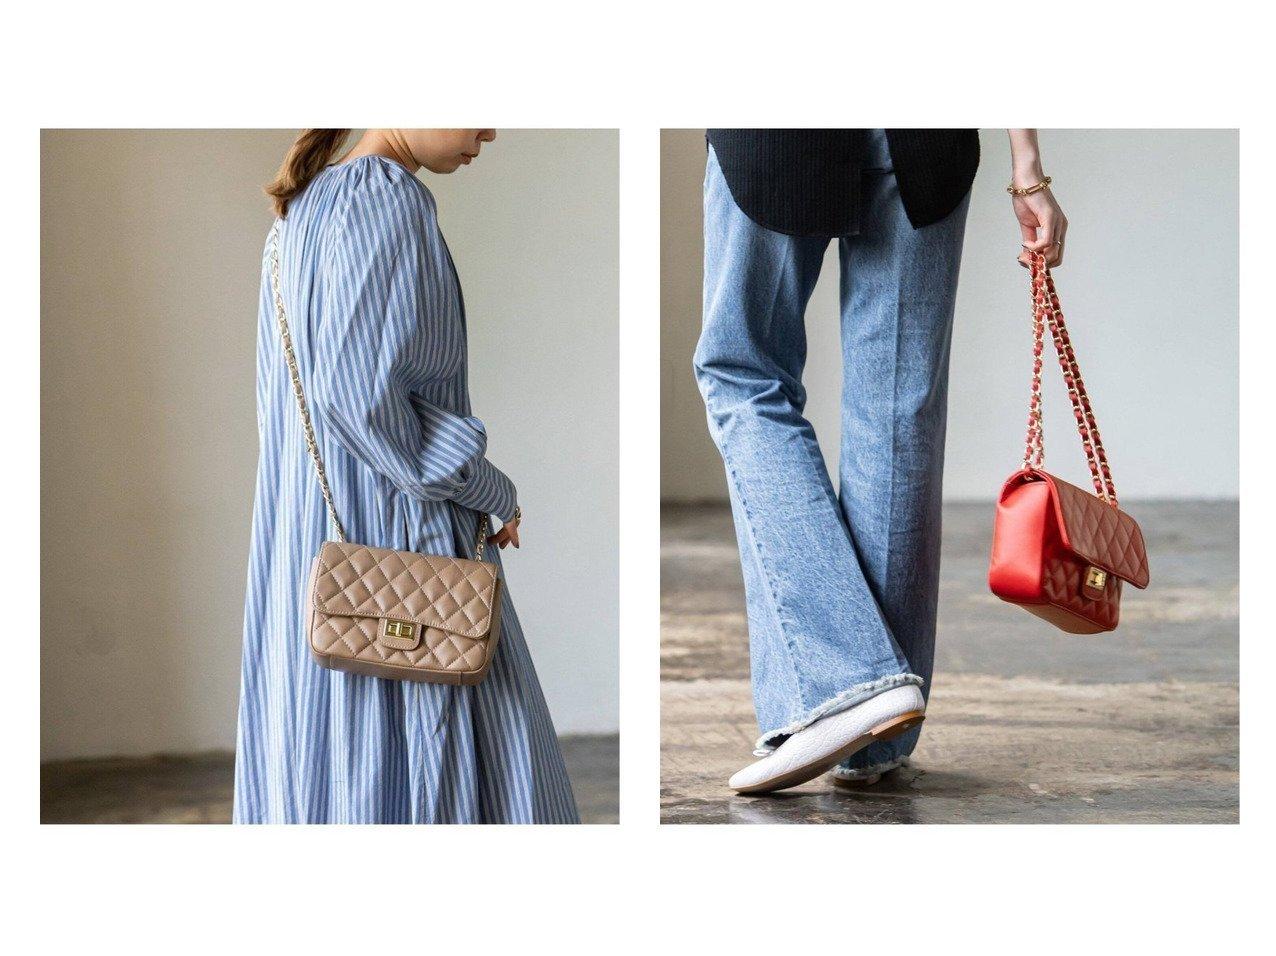 【NOBLE / Spick & Span/ノーブル / スピック&スパン】の3 【MAISON VINCENT】 チェーンバッグ 【バッグ・鞄】おすすめ!人気、トレンド・レディースファッションの通販 おすすめで人気の流行・トレンド、ファッションの通販商品 インテリア・家具・メンズファッション・キッズファッション・レディースファッション・服の通販 founy(ファニー) https://founy.com/ ファッション Fashion レディースファッション WOMEN バッグ Bag NEW・新作・新着・新入荷 New Arrivals 2021年 2021 2021-2022秋冬・A/W AW・Autumn/Winter・FW・Fall-Winter・2021-2022 A/W・秋冬 AW・Autumn/Winter・FW・Fall-Winter チェーン 再入荷 Restock/Back in Stock/Re Arrival |ID:crp329100000067747